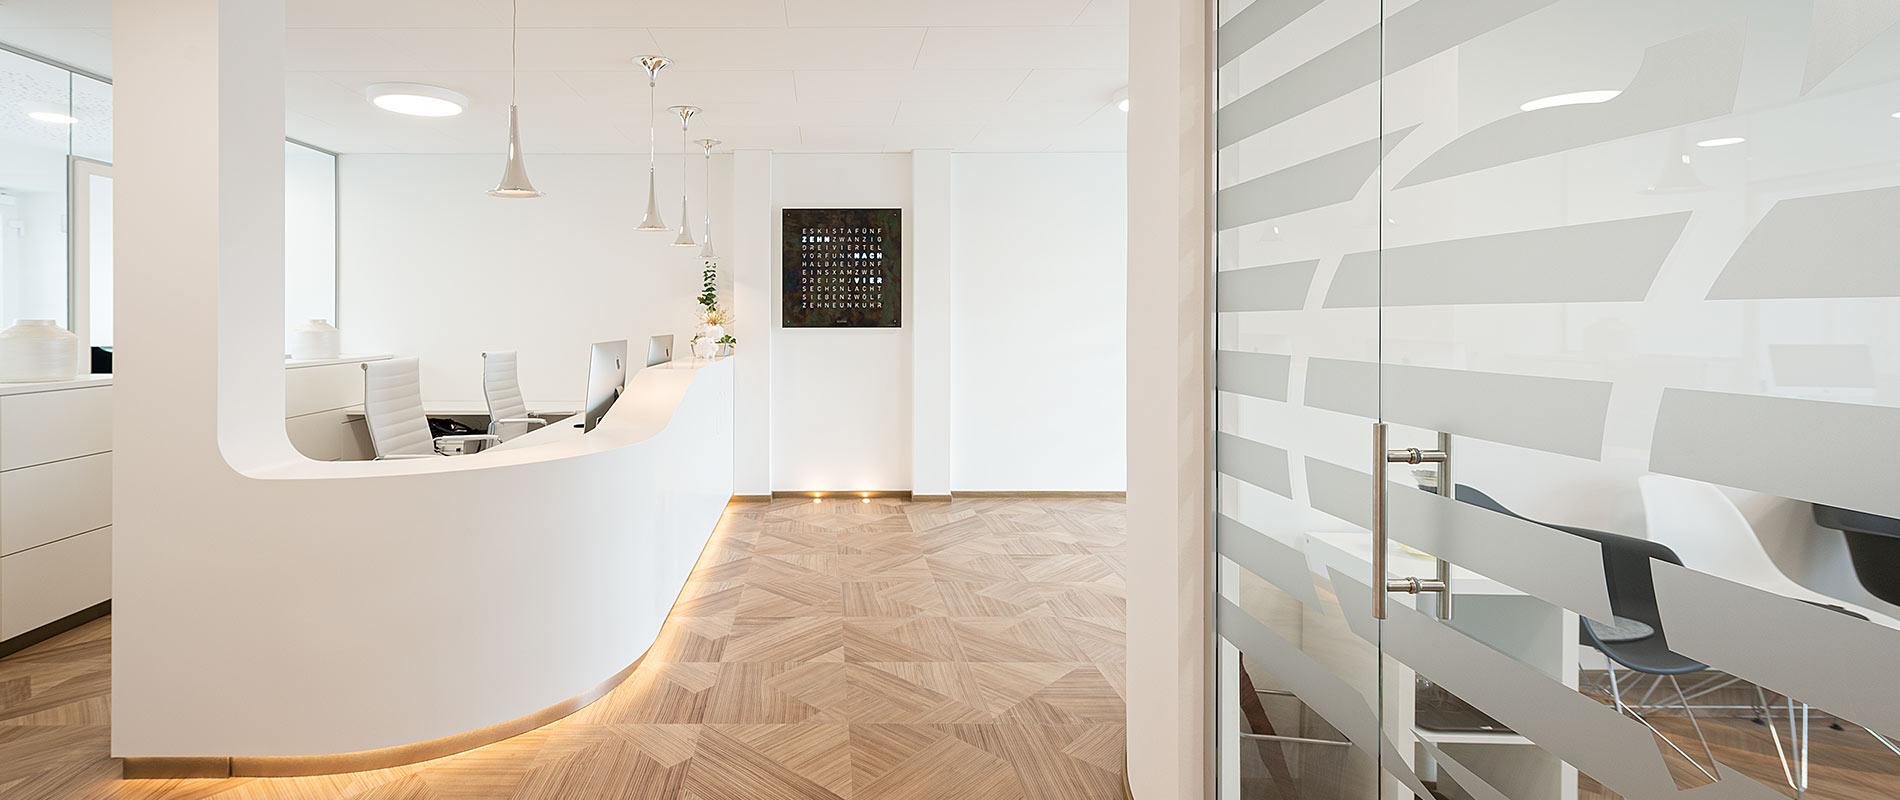 praxis-dr.buchholz-rosink-objekteinrichtungen_nordhorn-empfang